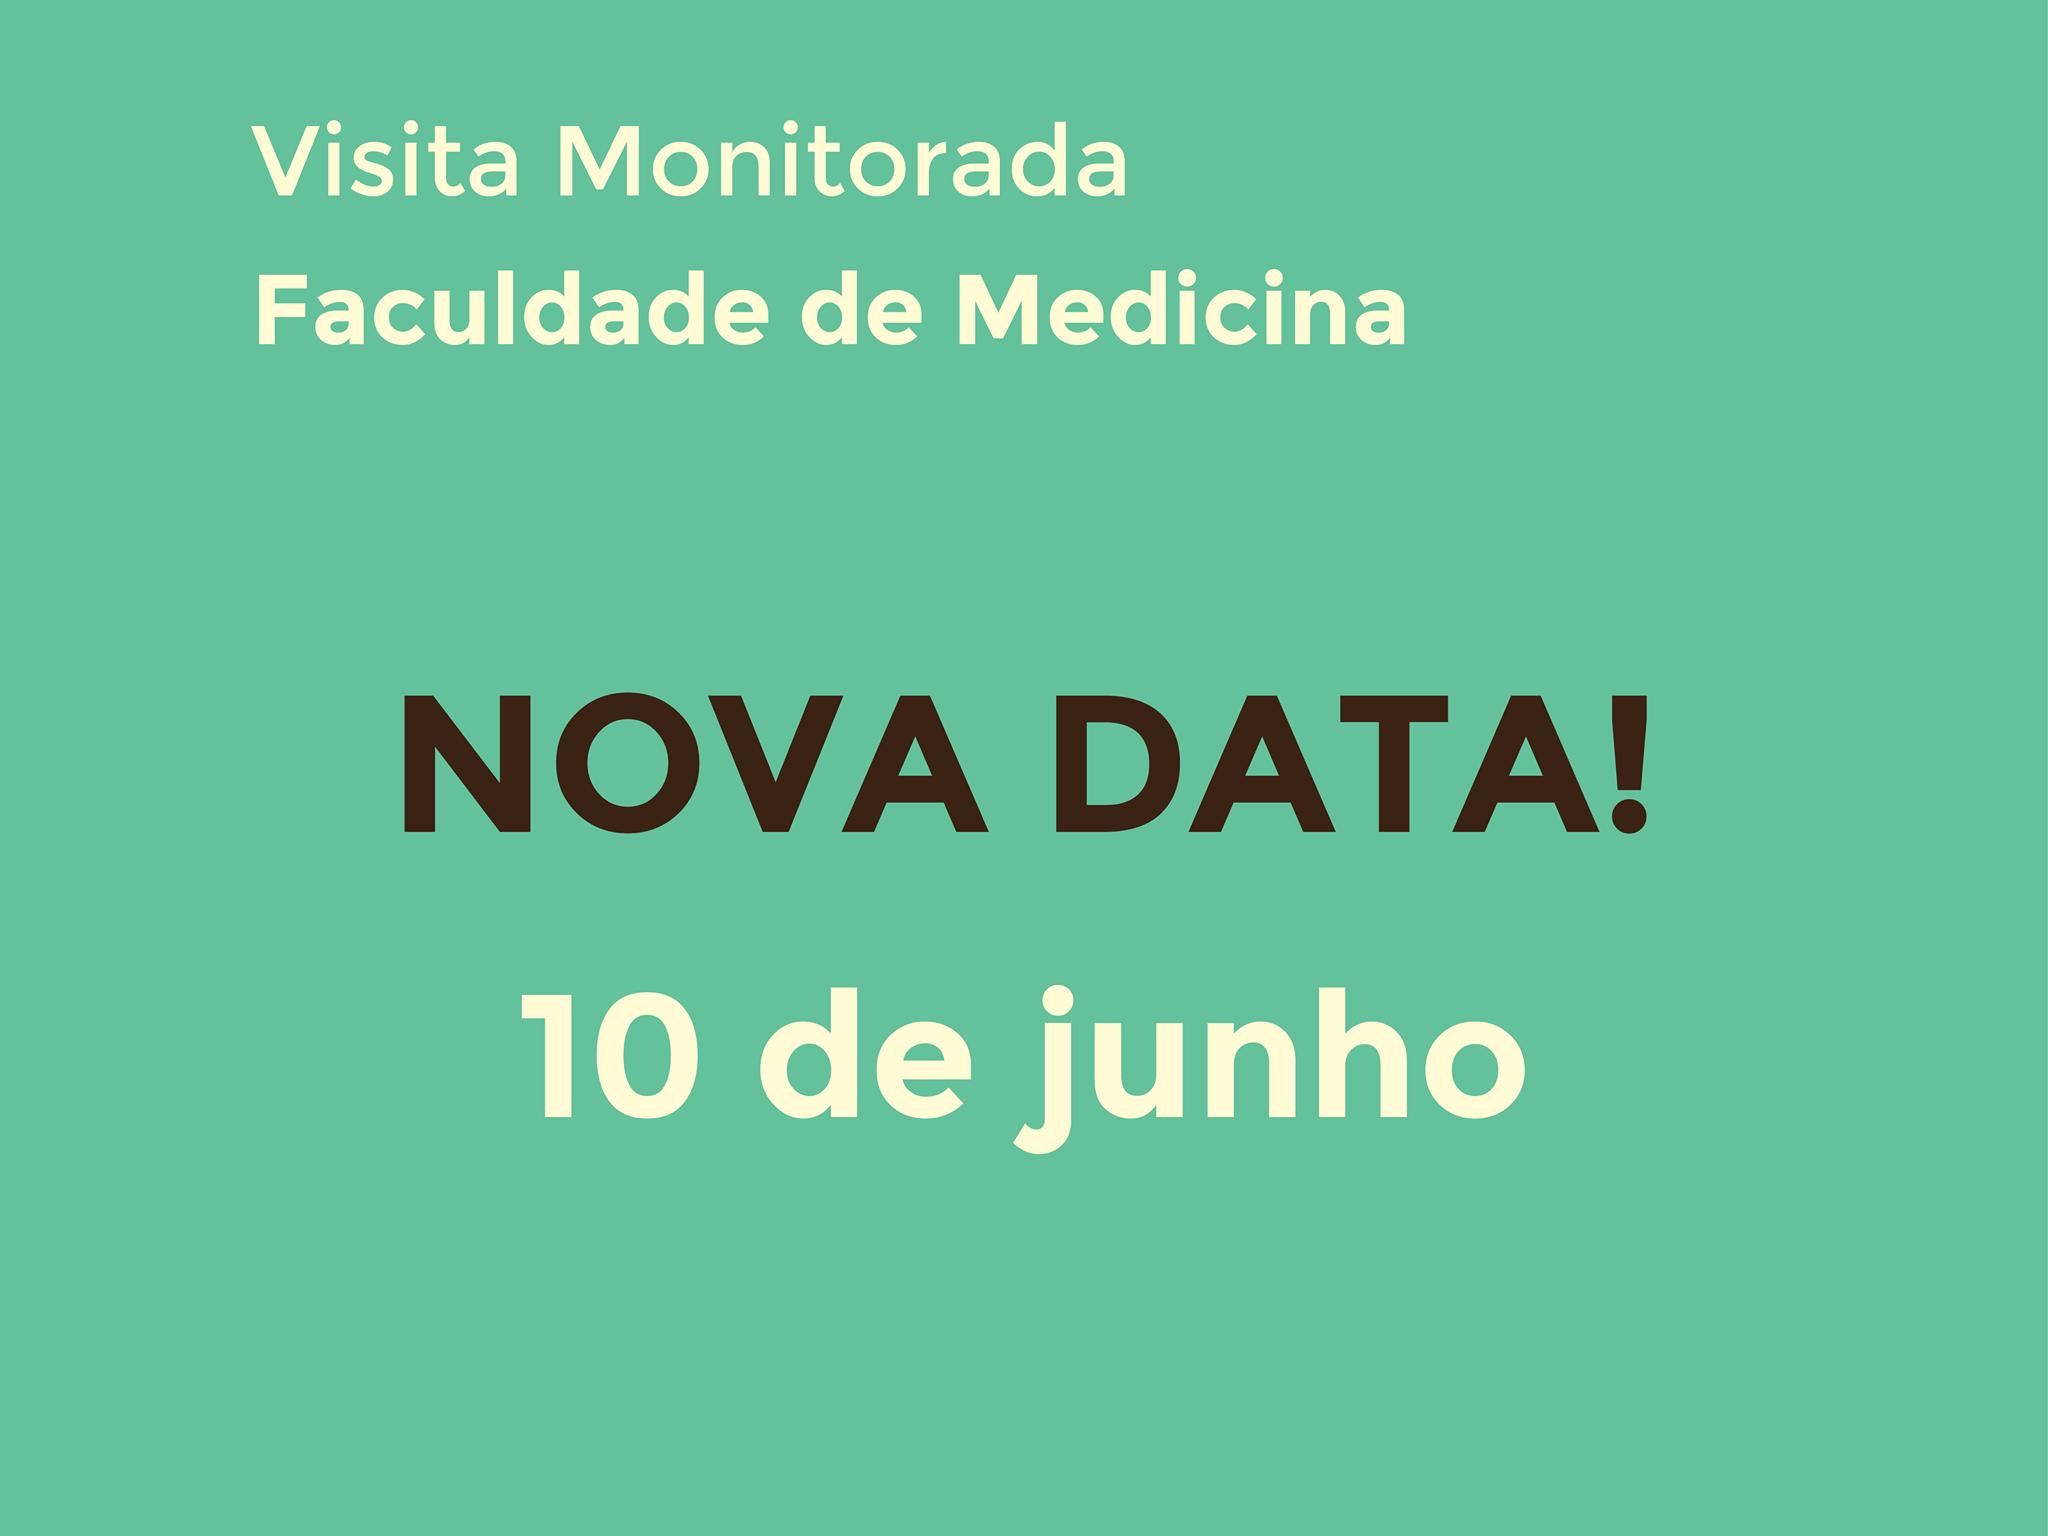 Nova data da visita monitorada da Faculdade de Medicina! - 10 de junho